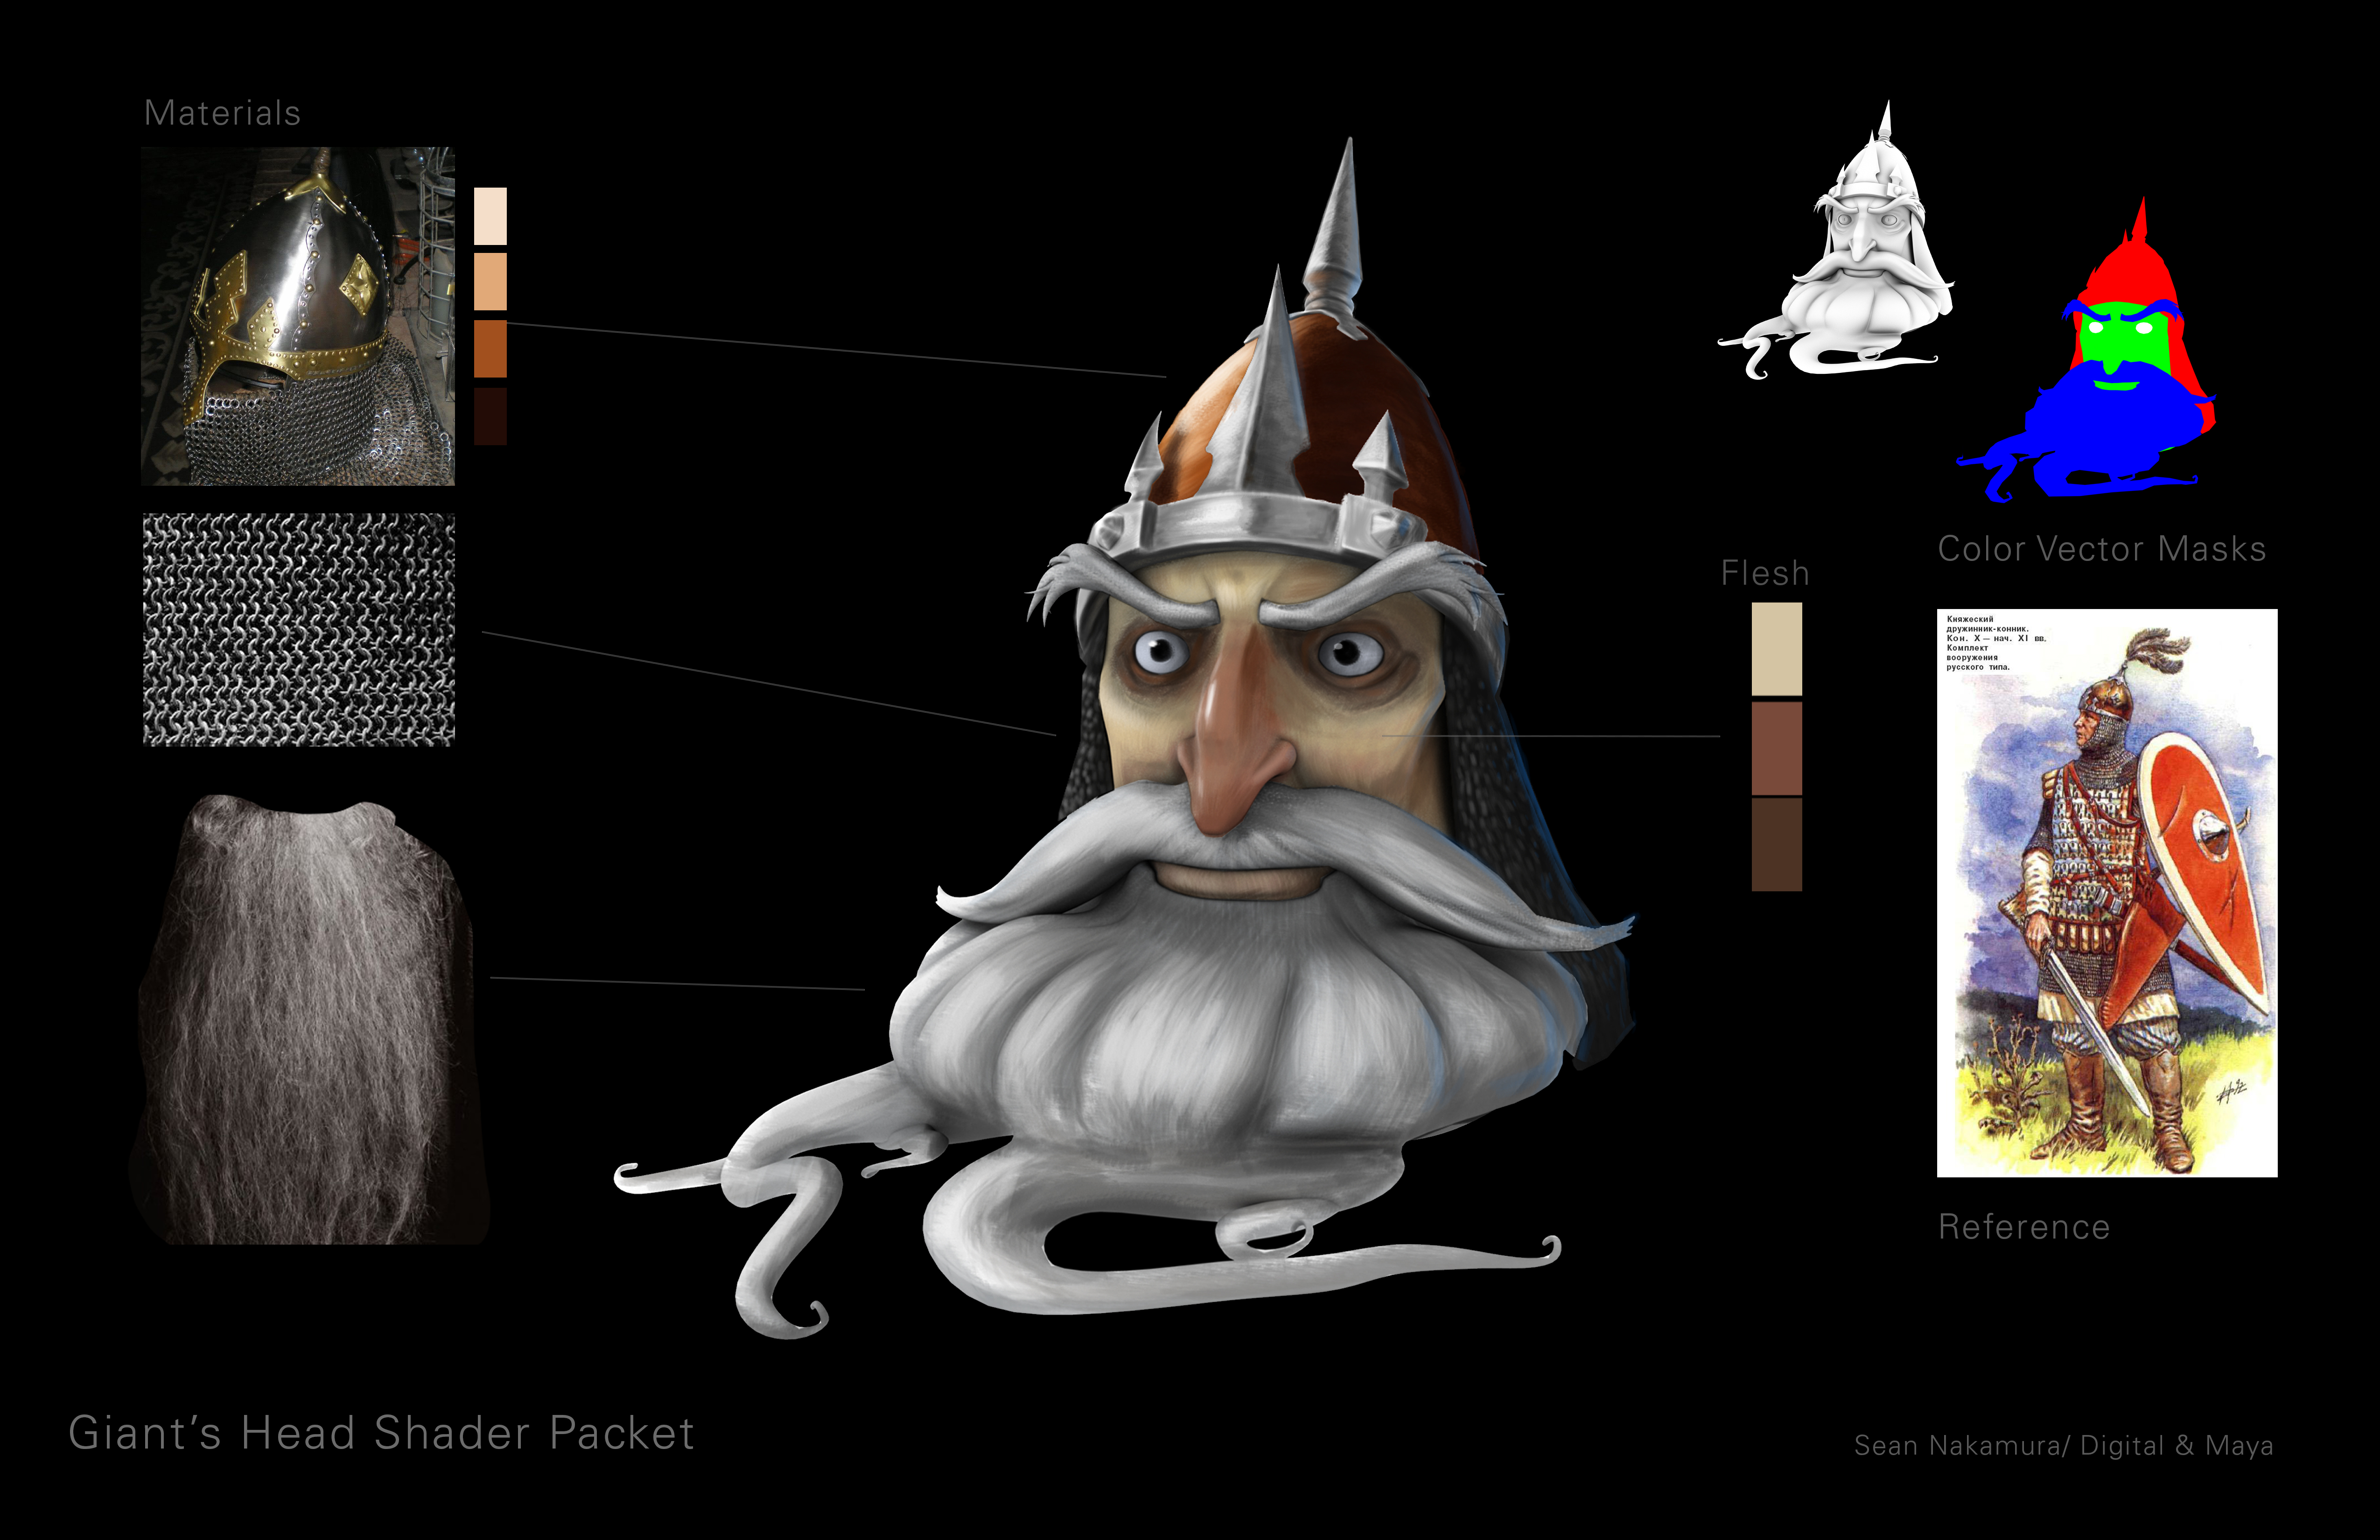 Sean_Nakamura_Giant_shaders_materials